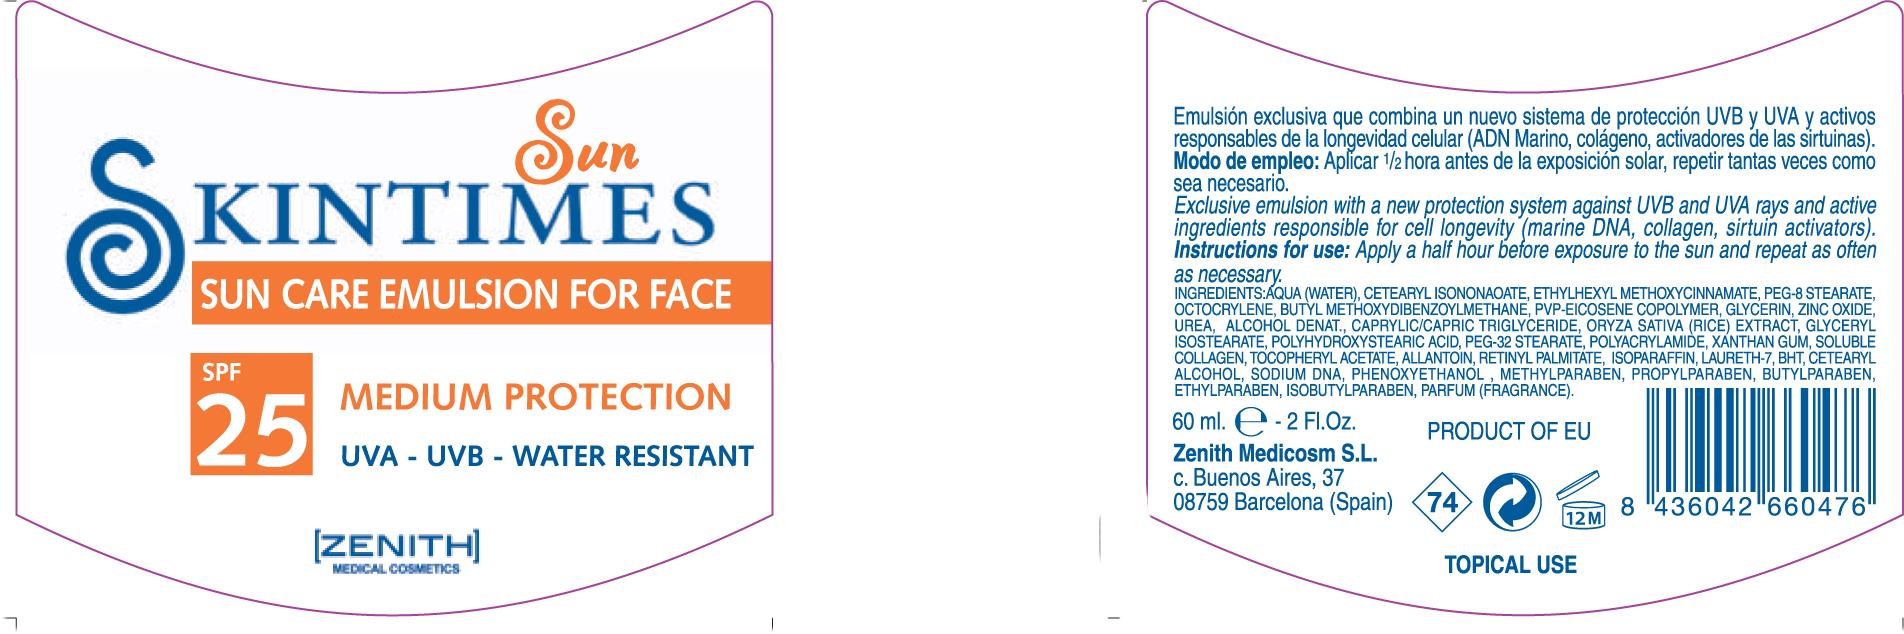 Sun Care For Face (Octinoxate Avobenzone Zinc Oxide Octocrylene) Emulsion [Zenith Medicosm Sl]